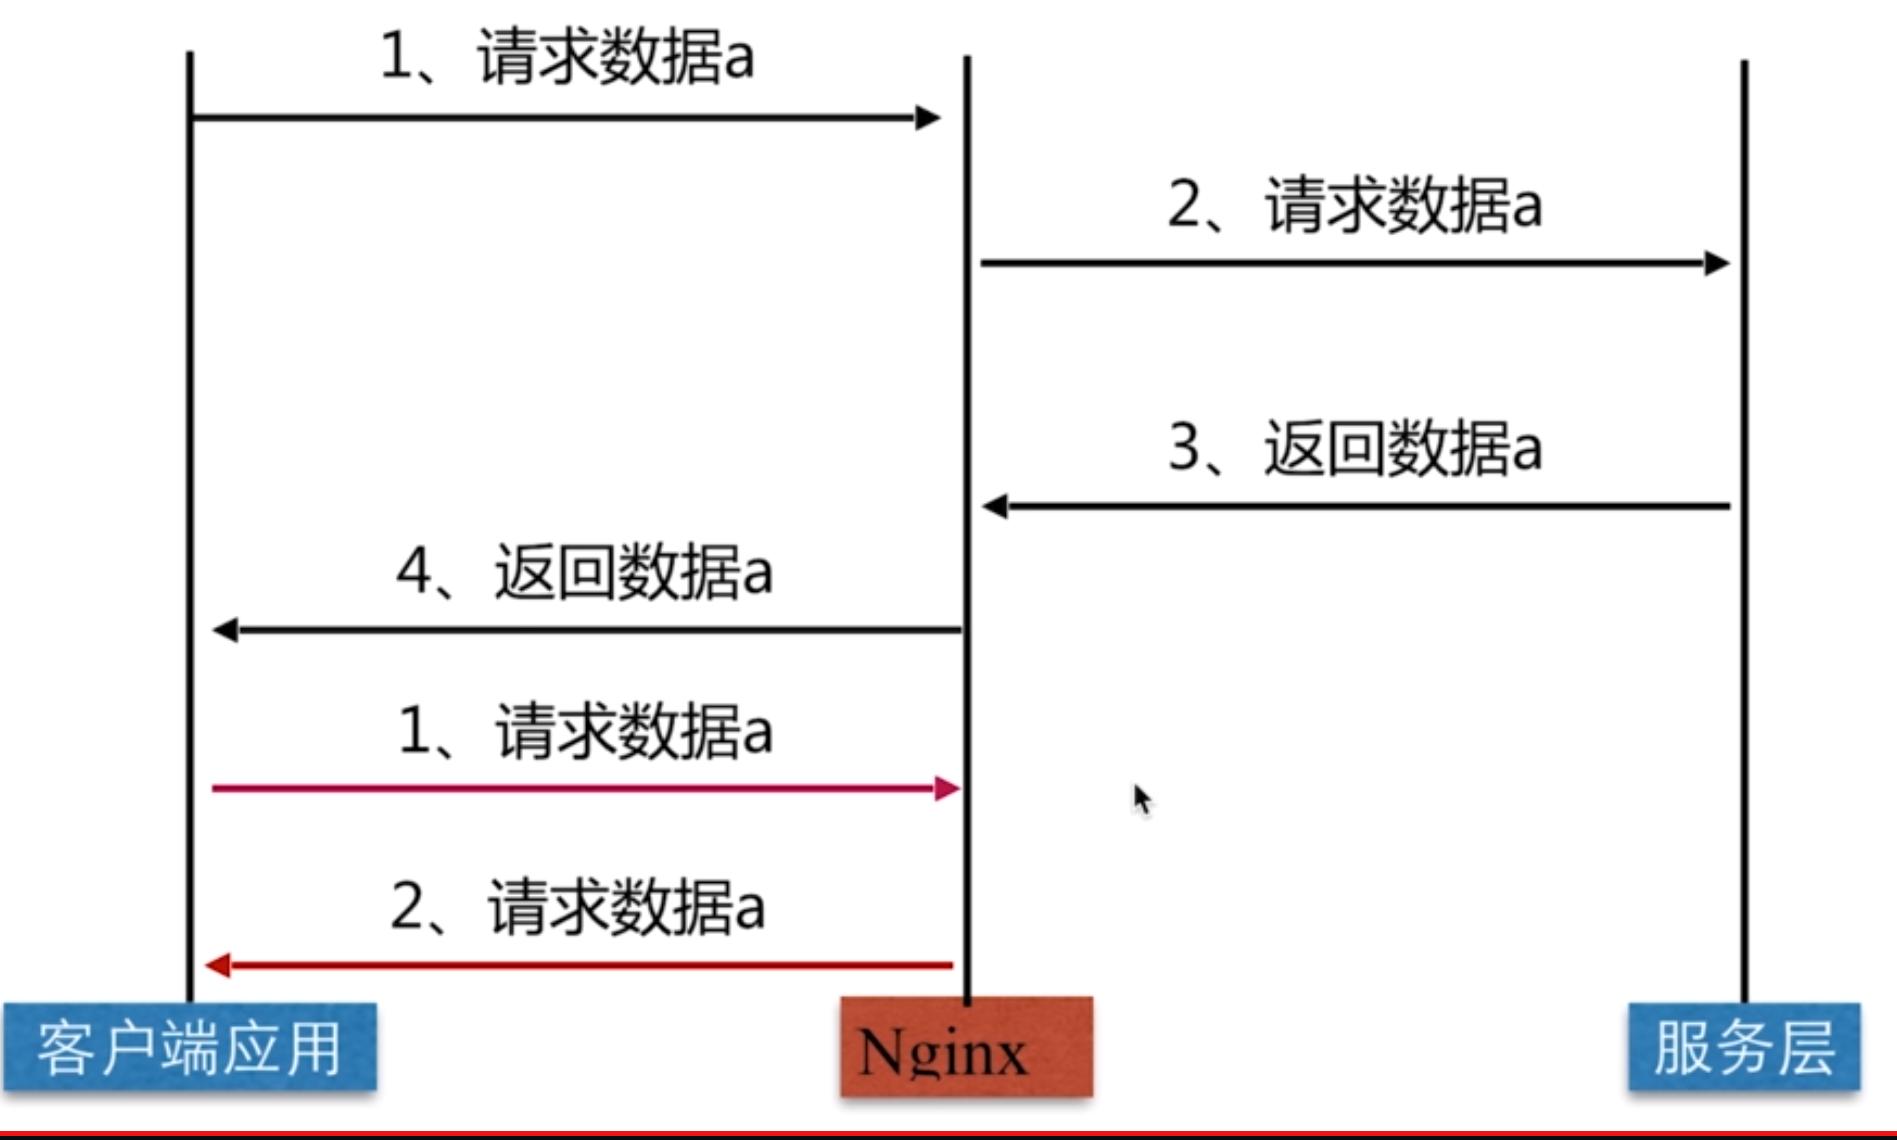 Nginx作为缓存服务